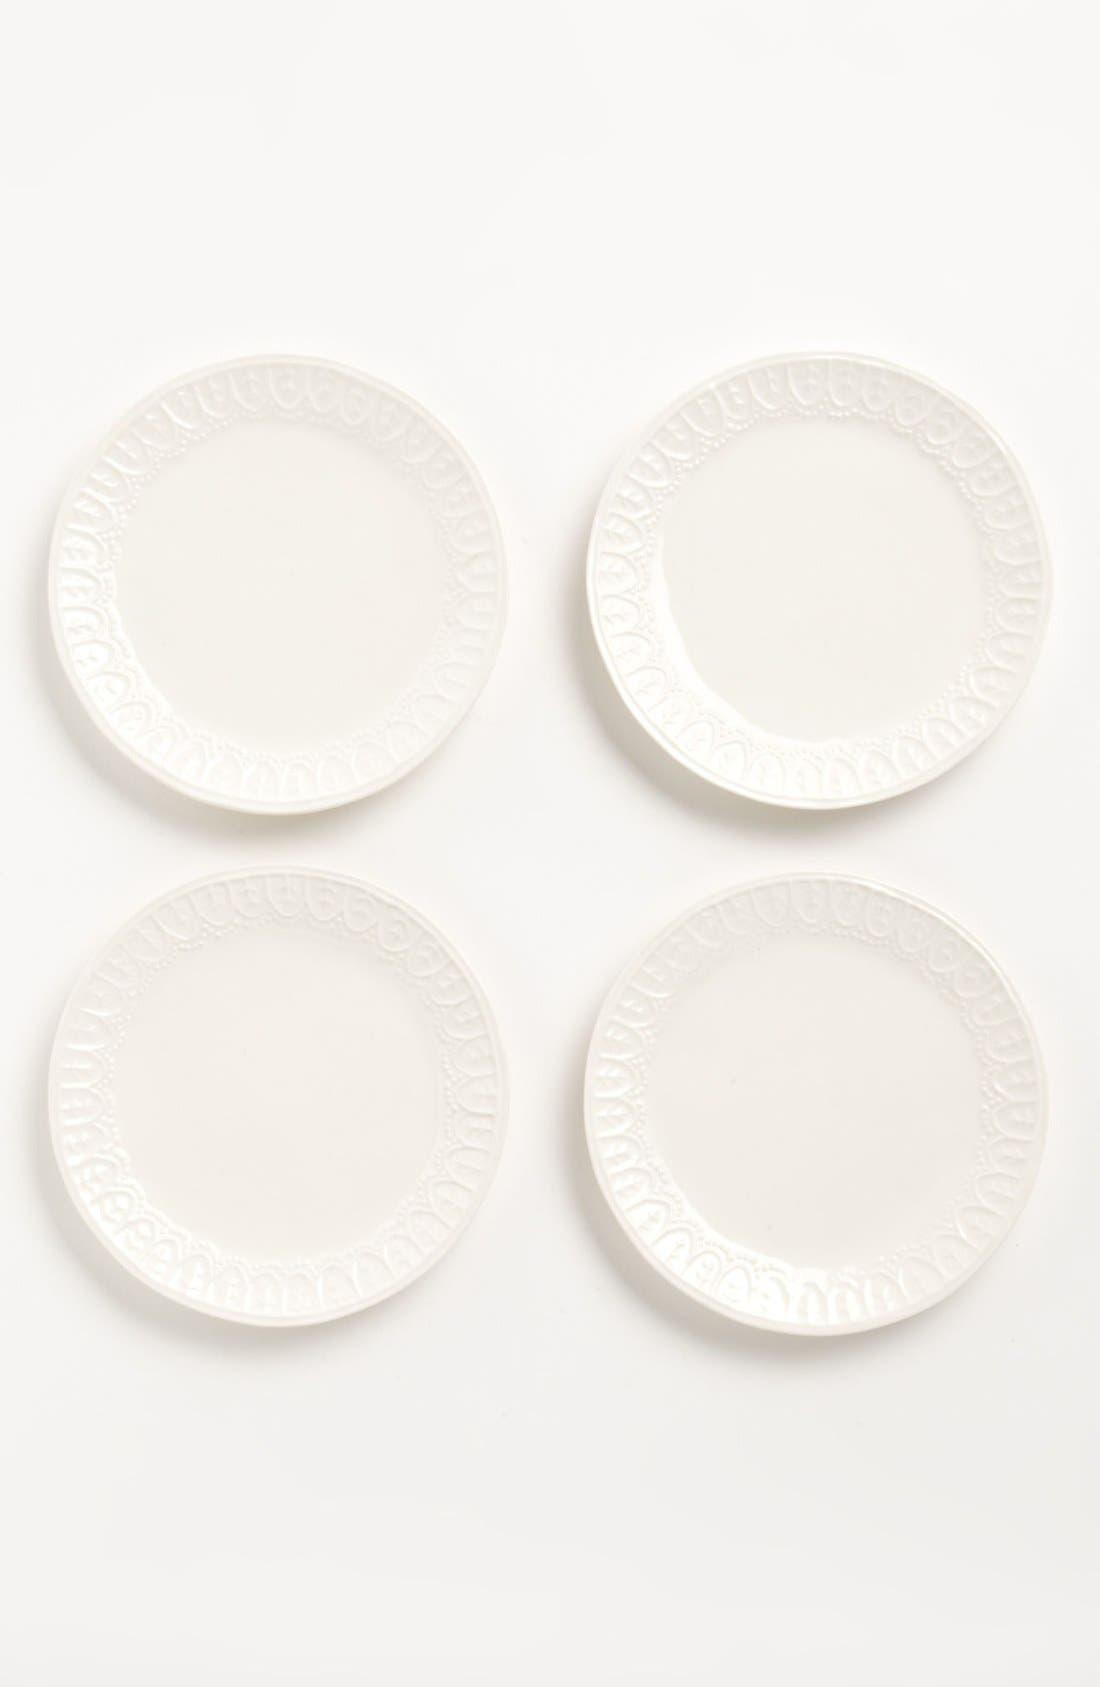 Main Image - Magenta 'Bohemian Lace' Salad Plates (Set of 4)